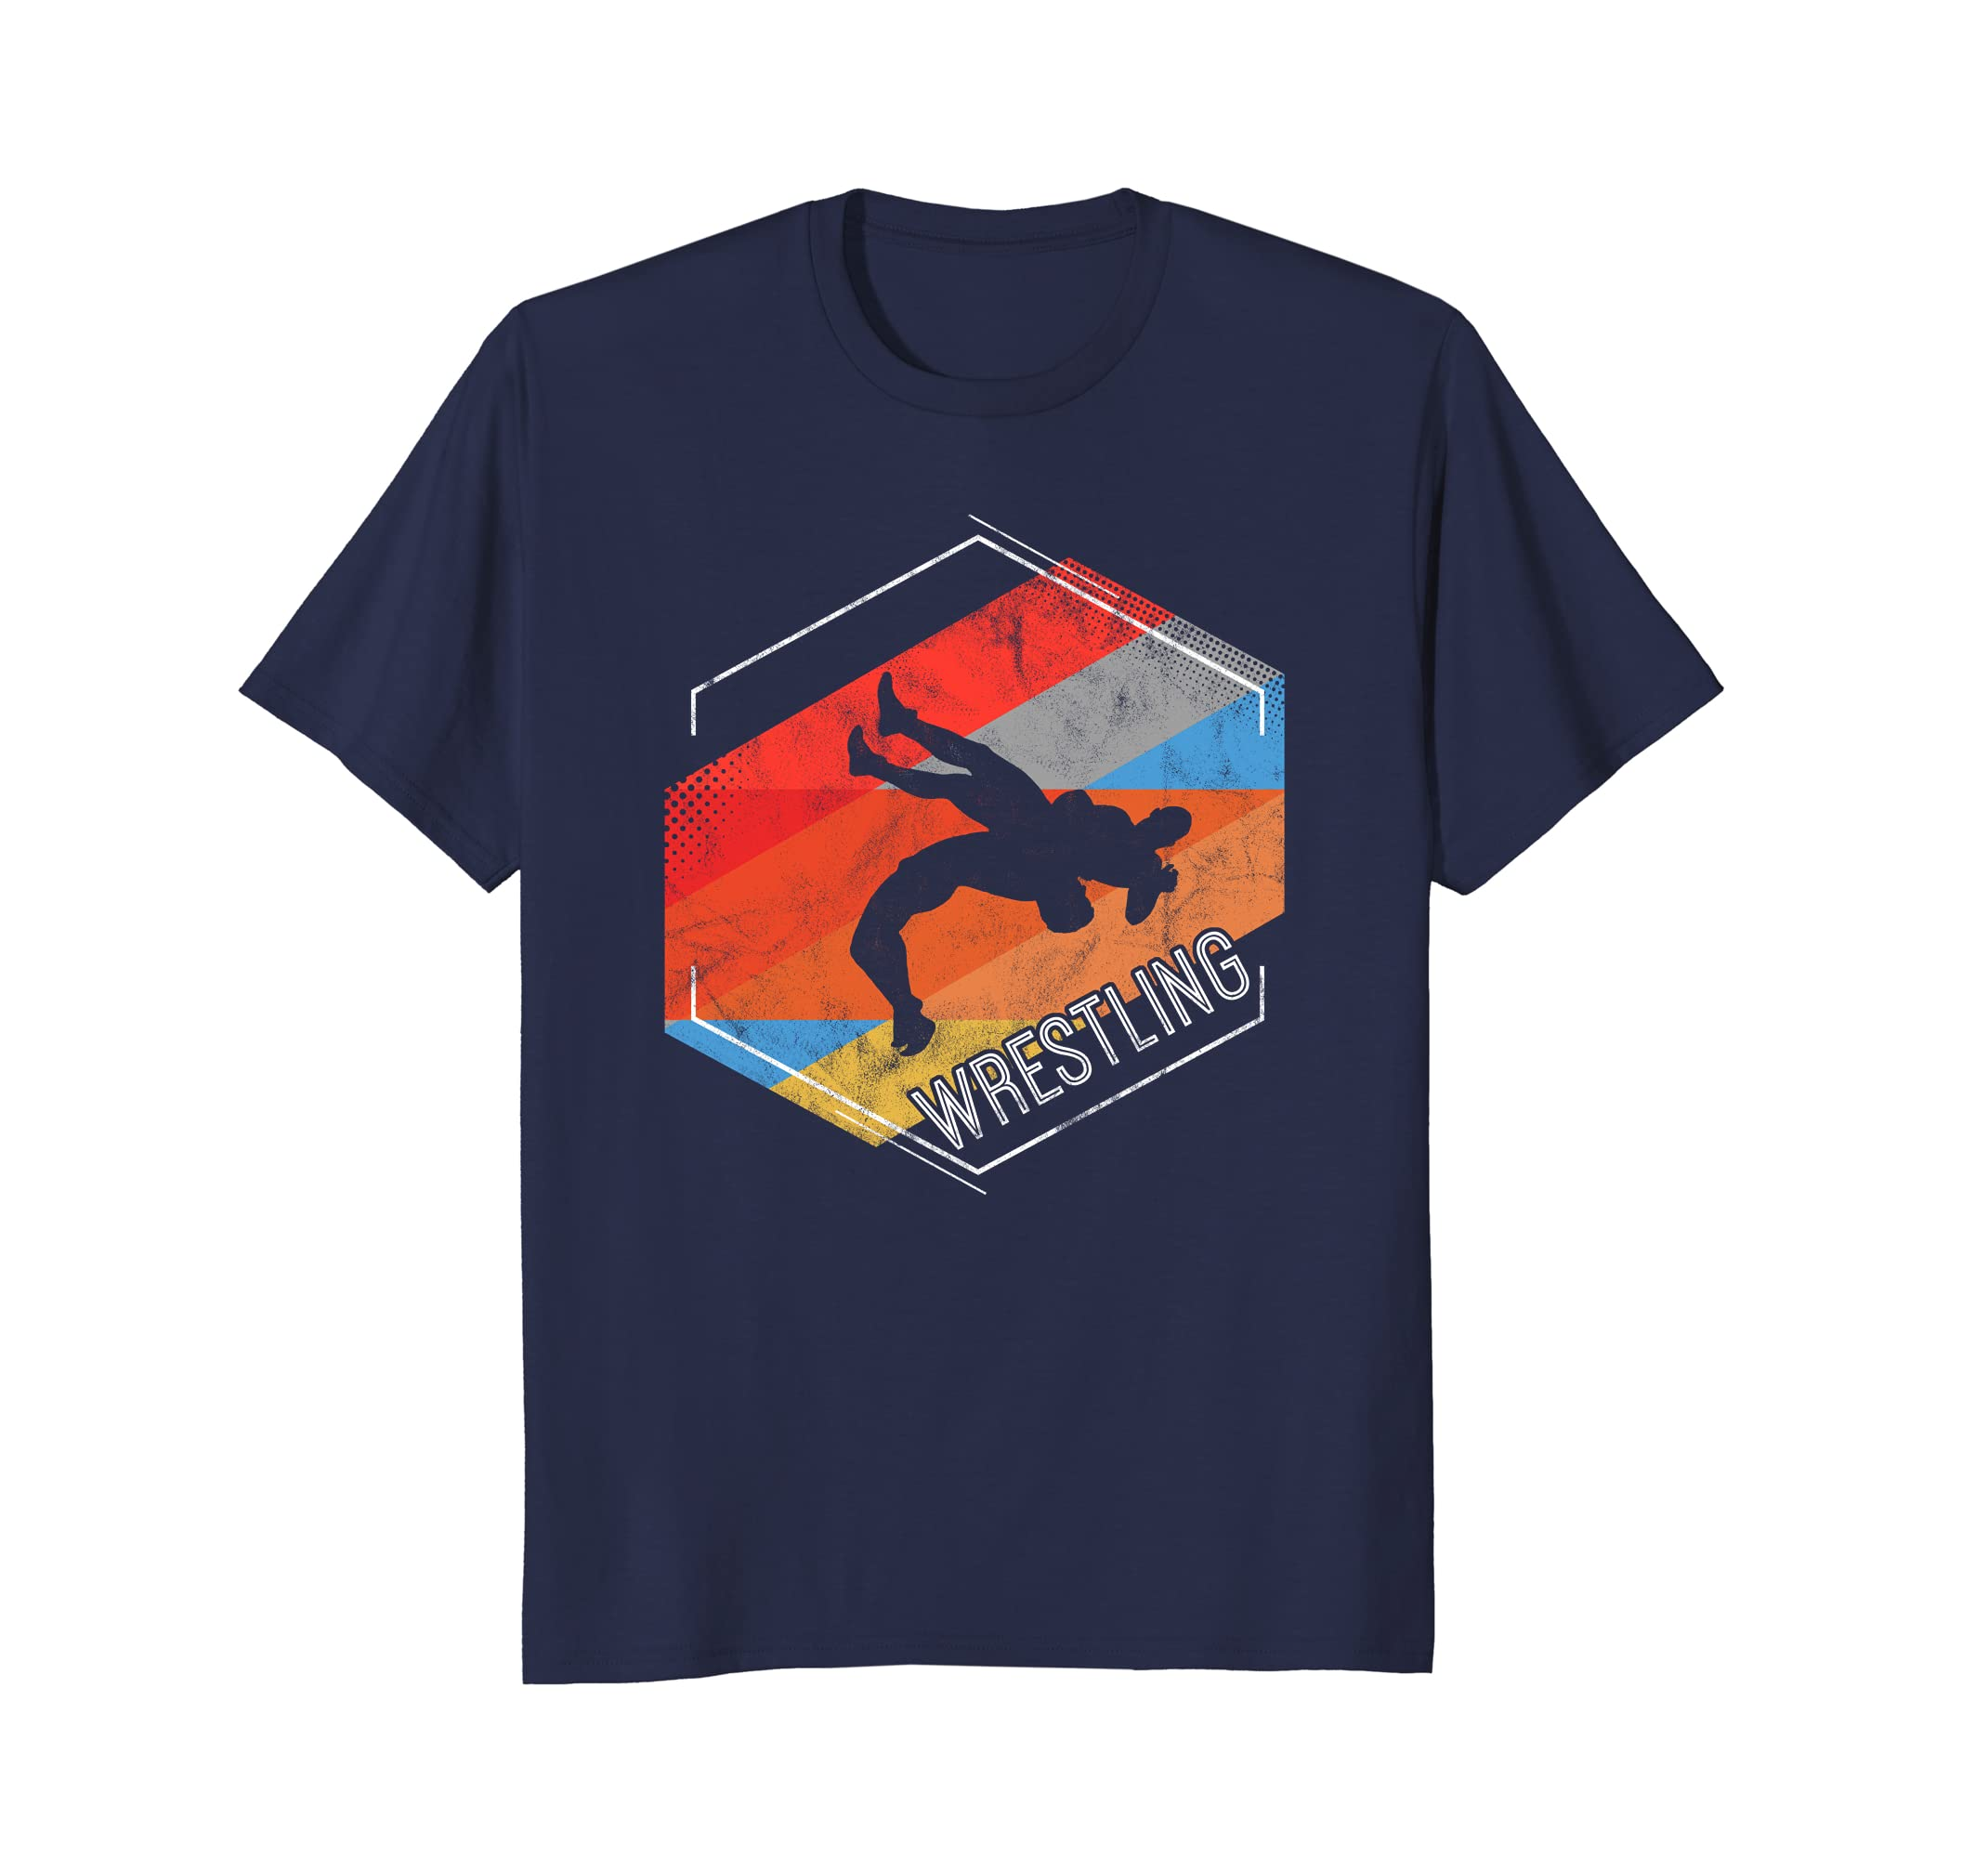 Wrestling Shirt Gift for Wrestler Vintage Graphic tee-ah my shirt one gift